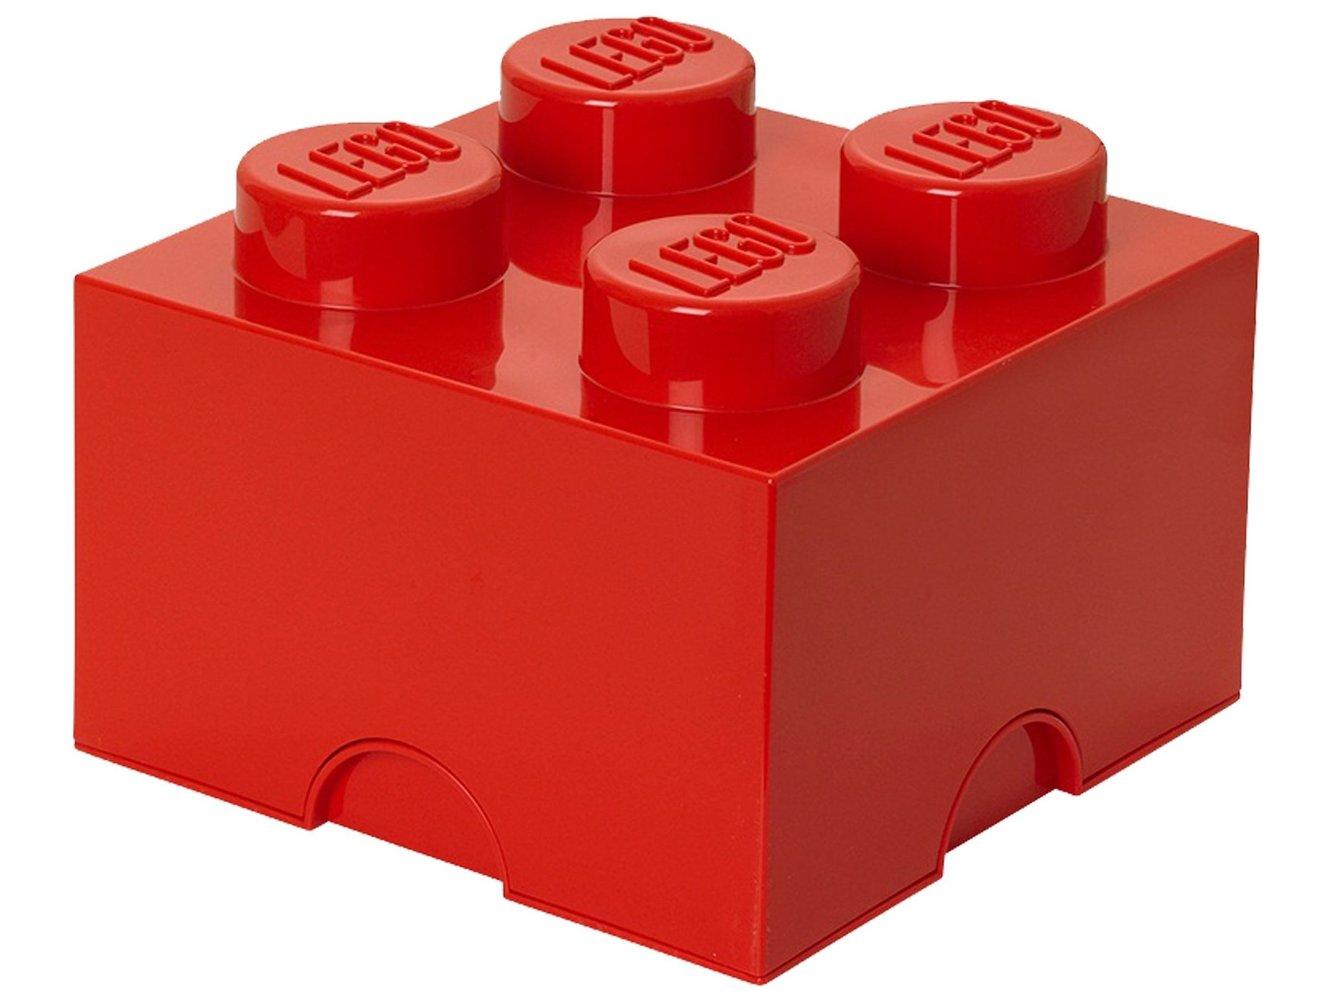 4 stud Red Storage Brick